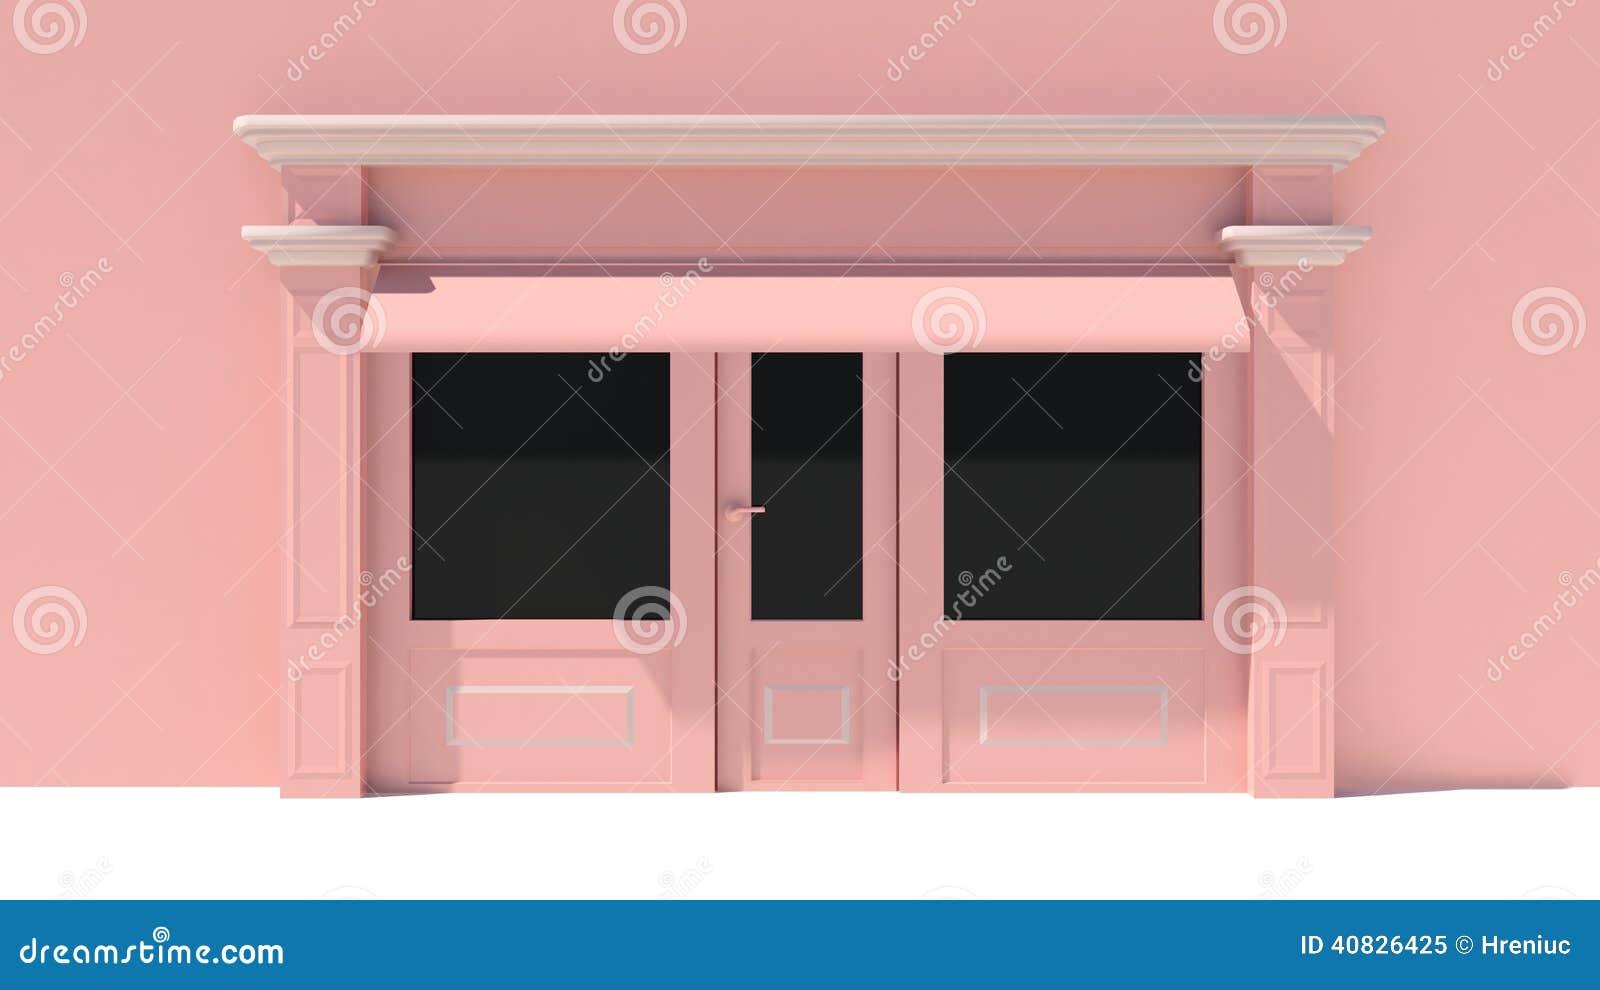 #85A526  as grandes janelas brancas e fachada cor de rosa da loja com toldos 1510 Toldos Para Janelas De Apartamentos Preços